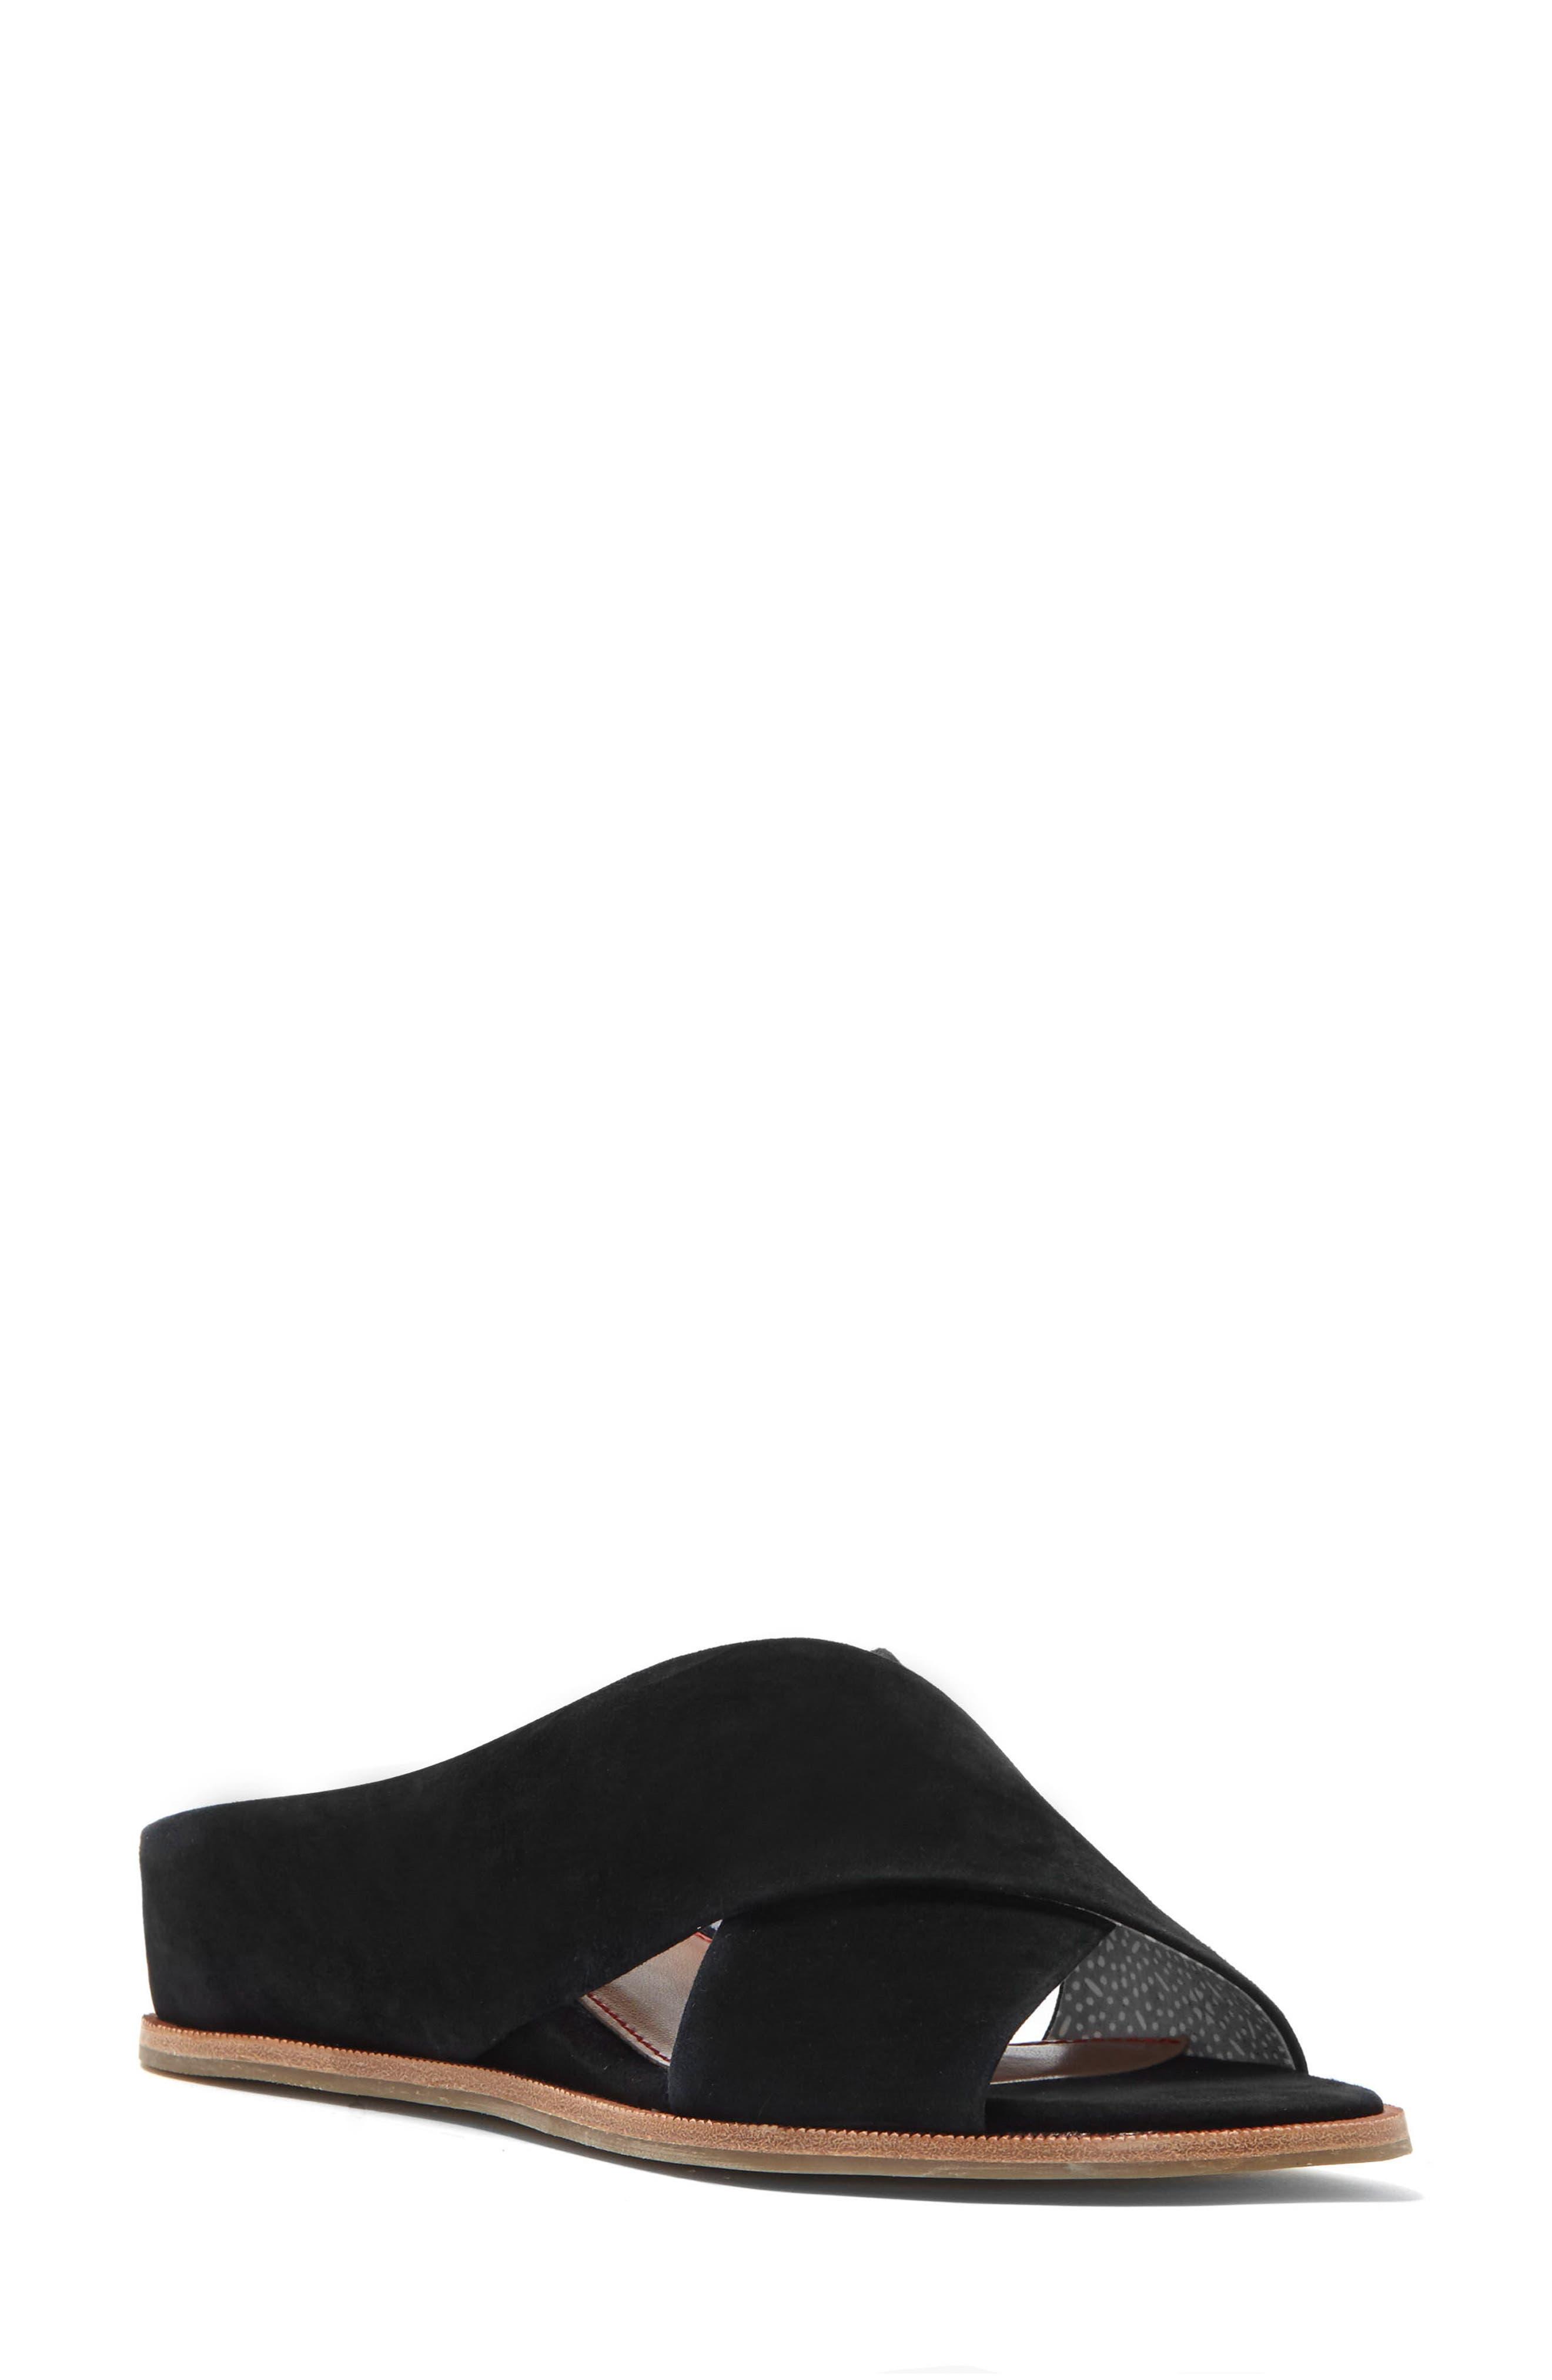 Treya Slide Sandal,                         Main,                         color,